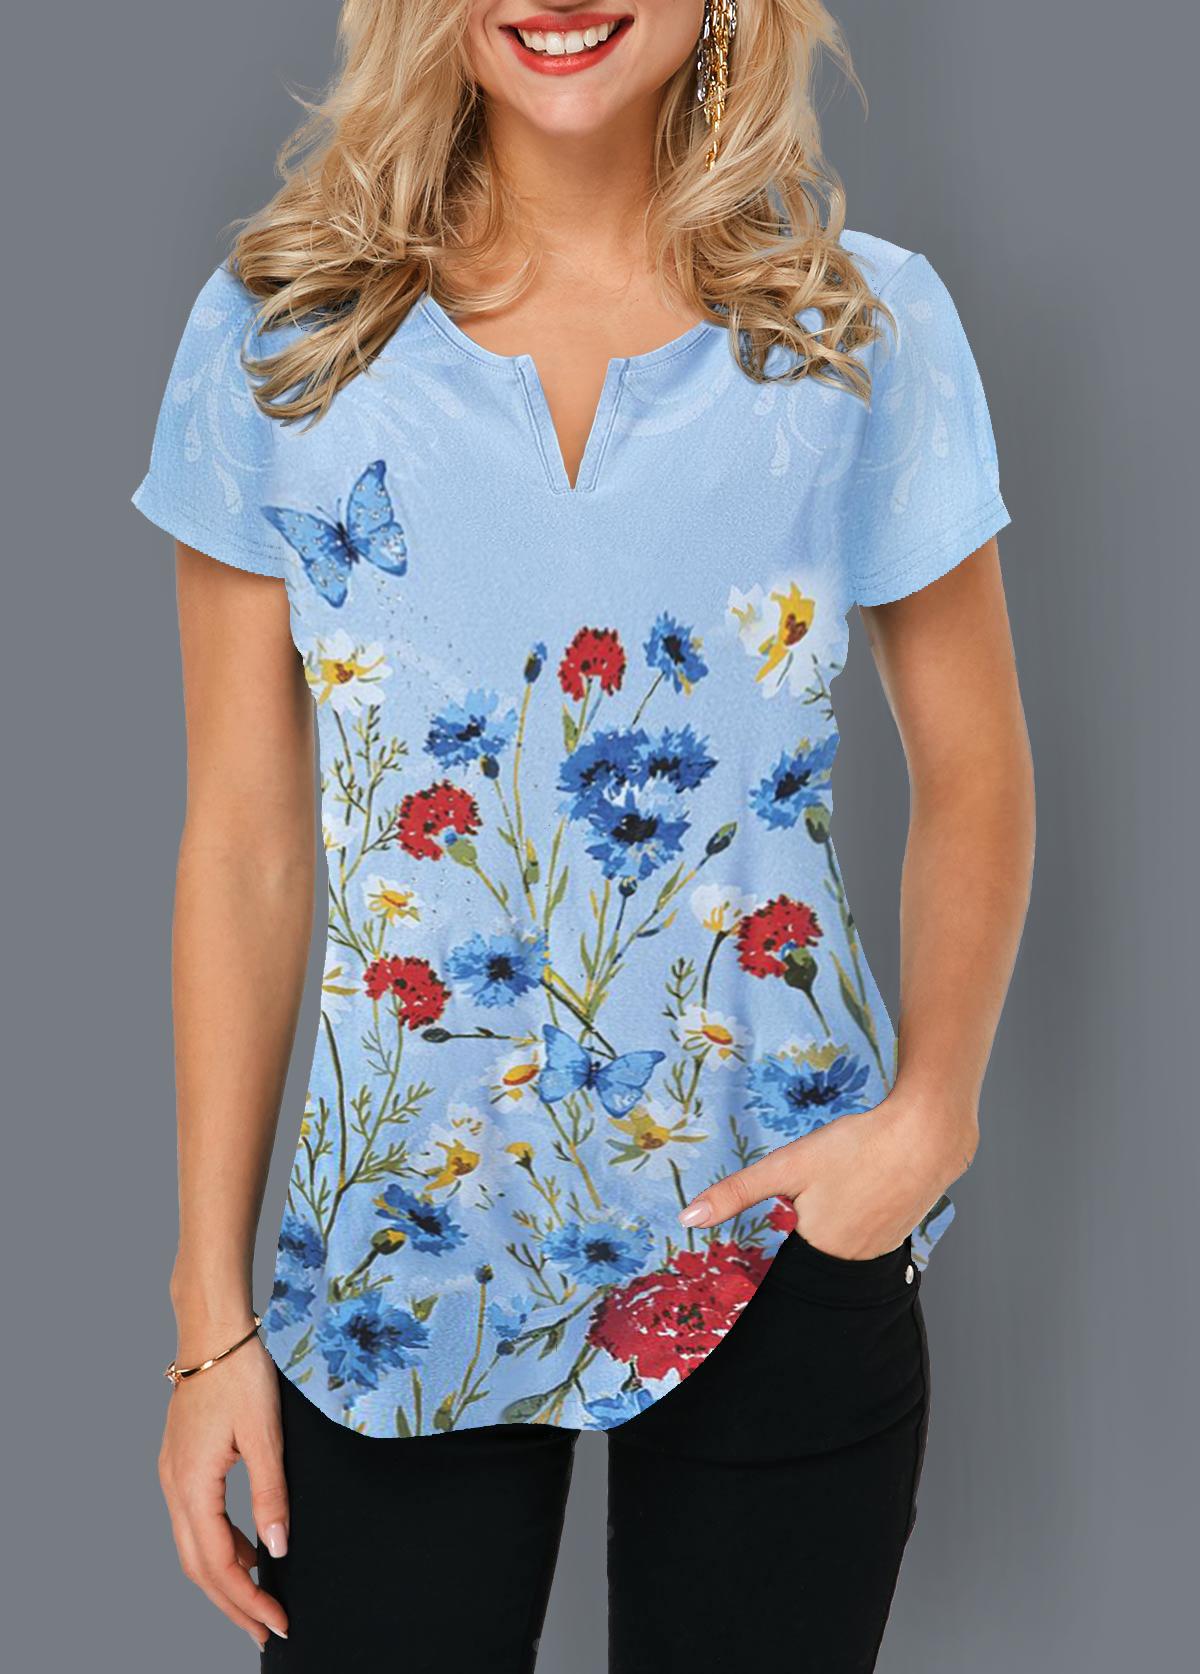 Notch Neck Short Sleeve Floral Print T Shirt